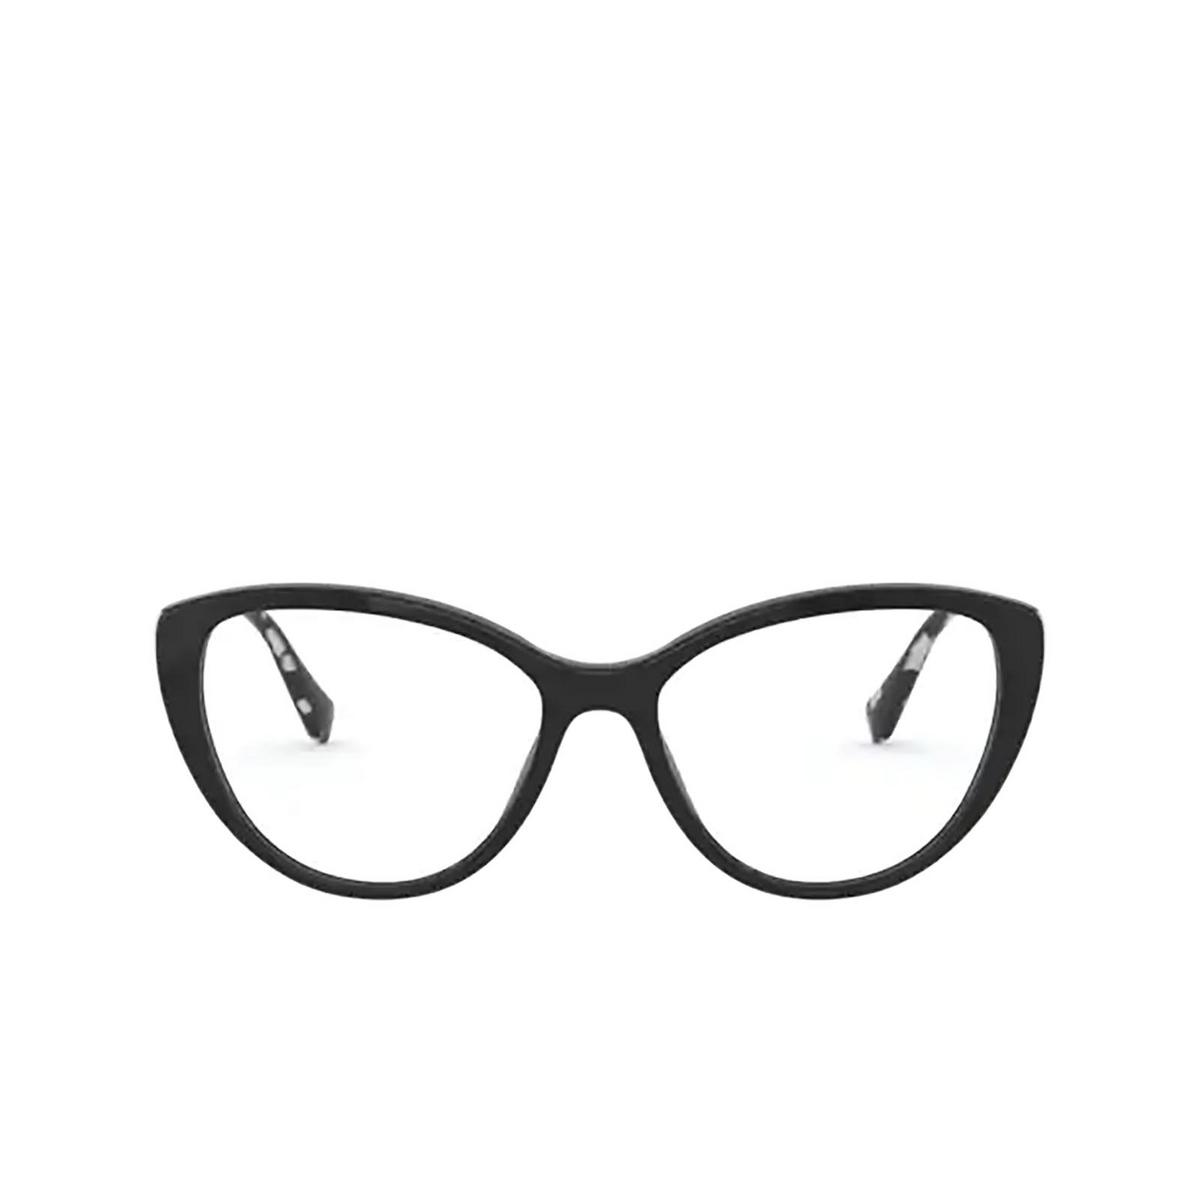 Miu Miu® Cat-eye Eyeglasses: MU 02SV color 1AB1O1 - front view.